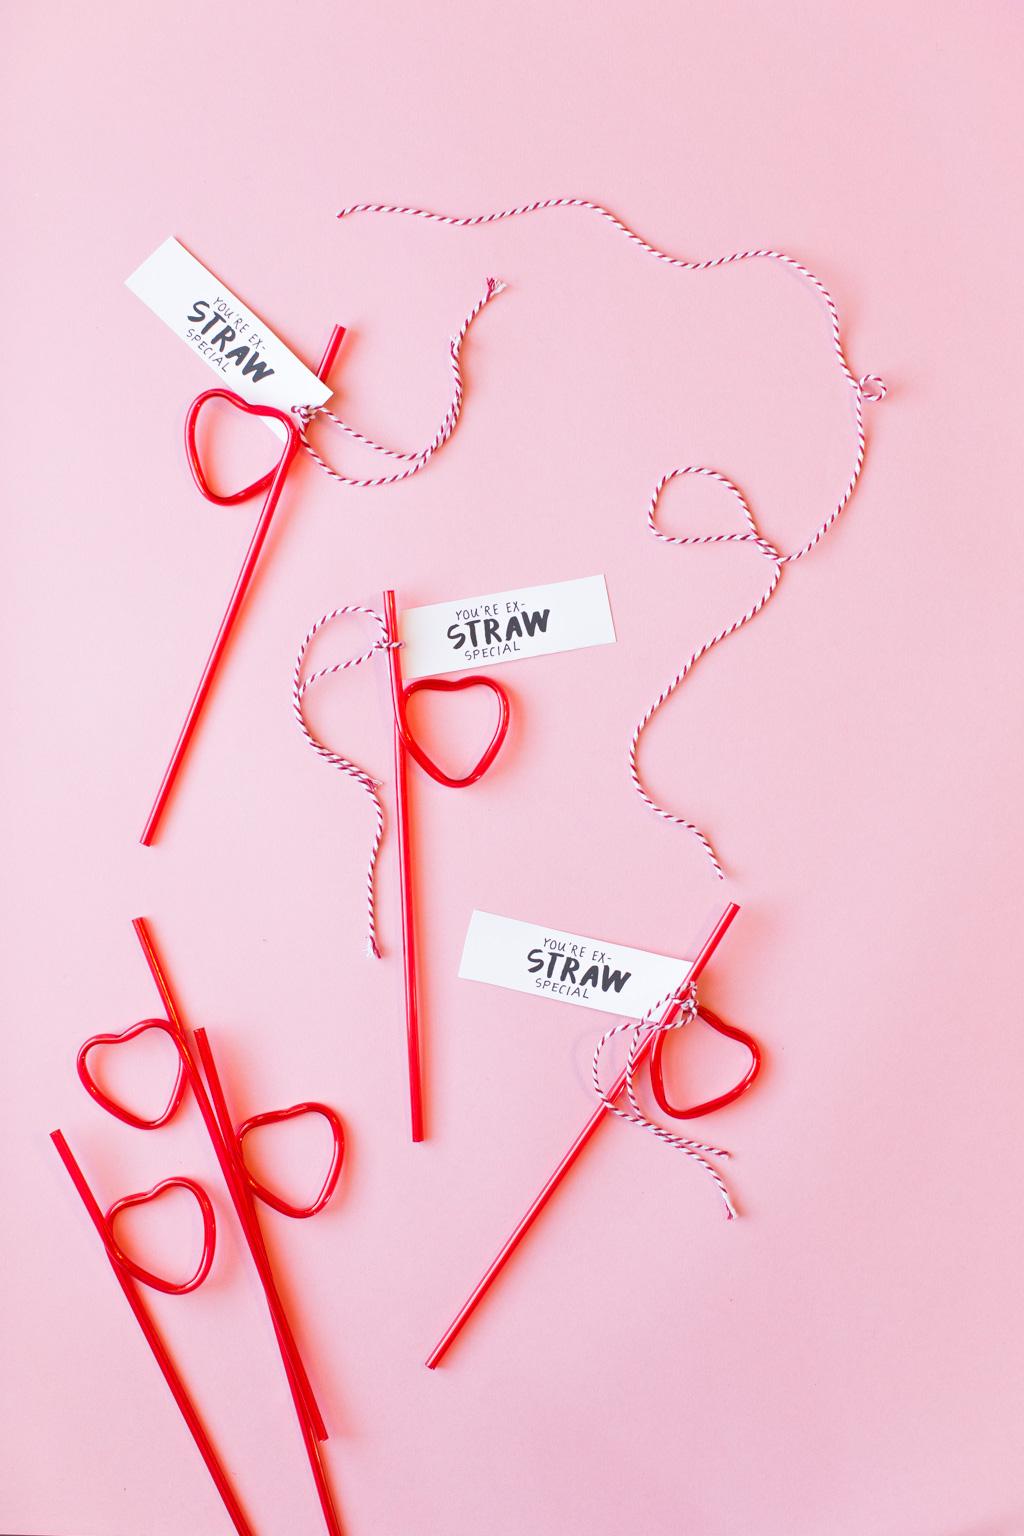 http://sayyes.com/wp-content/uploads/2016/02/ex_STRAW_special_Valentine1.jpg